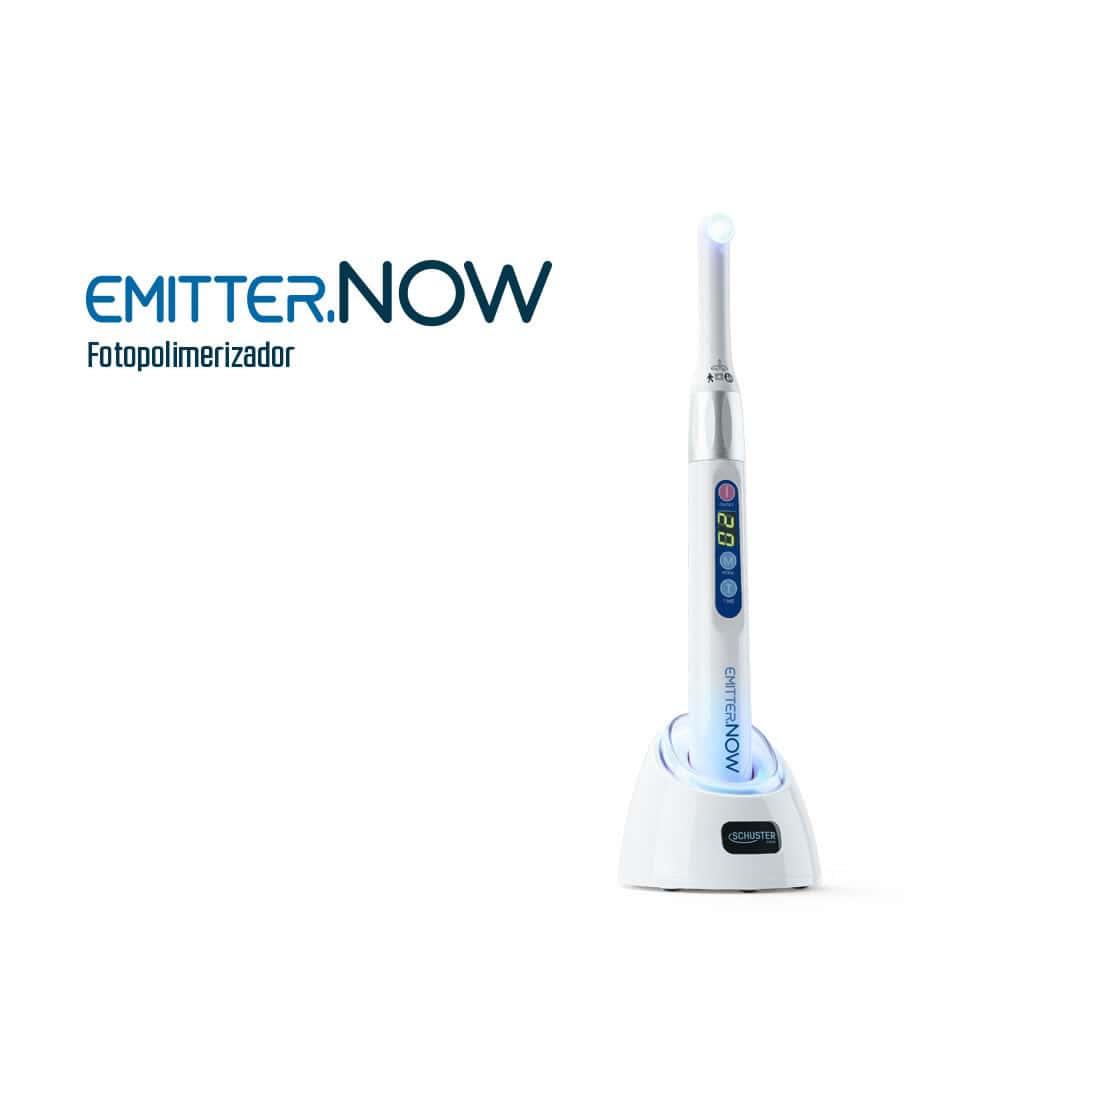 Fotopolimerizador Emitter NOW Wireless (Sem fio) - Schuster